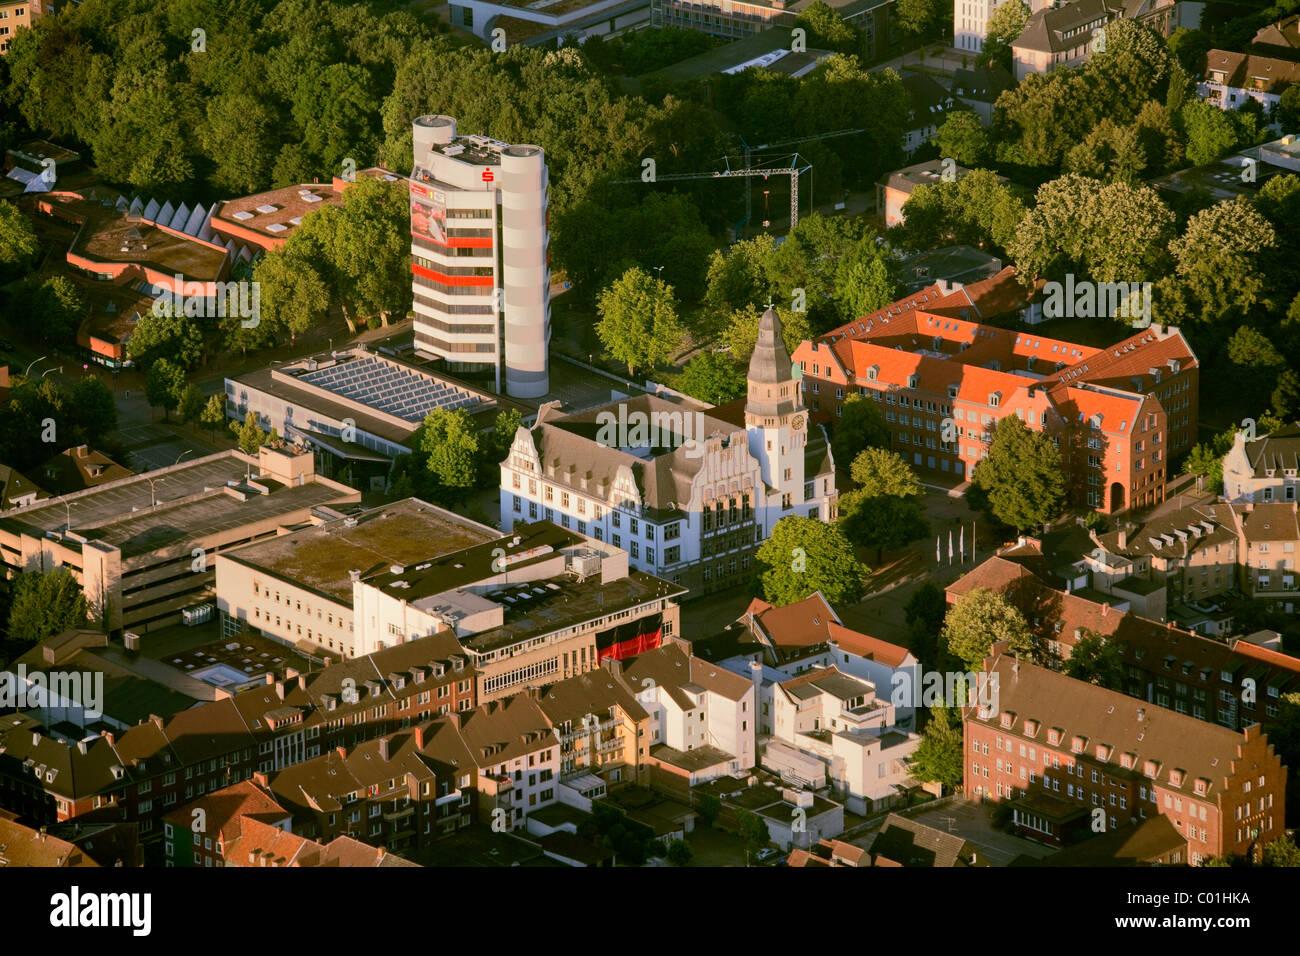 Aerial view, town hall, Gladbeck, Ruhrgebiet area, North Rhine-Westphalia, Germany, Europe - Stock Image